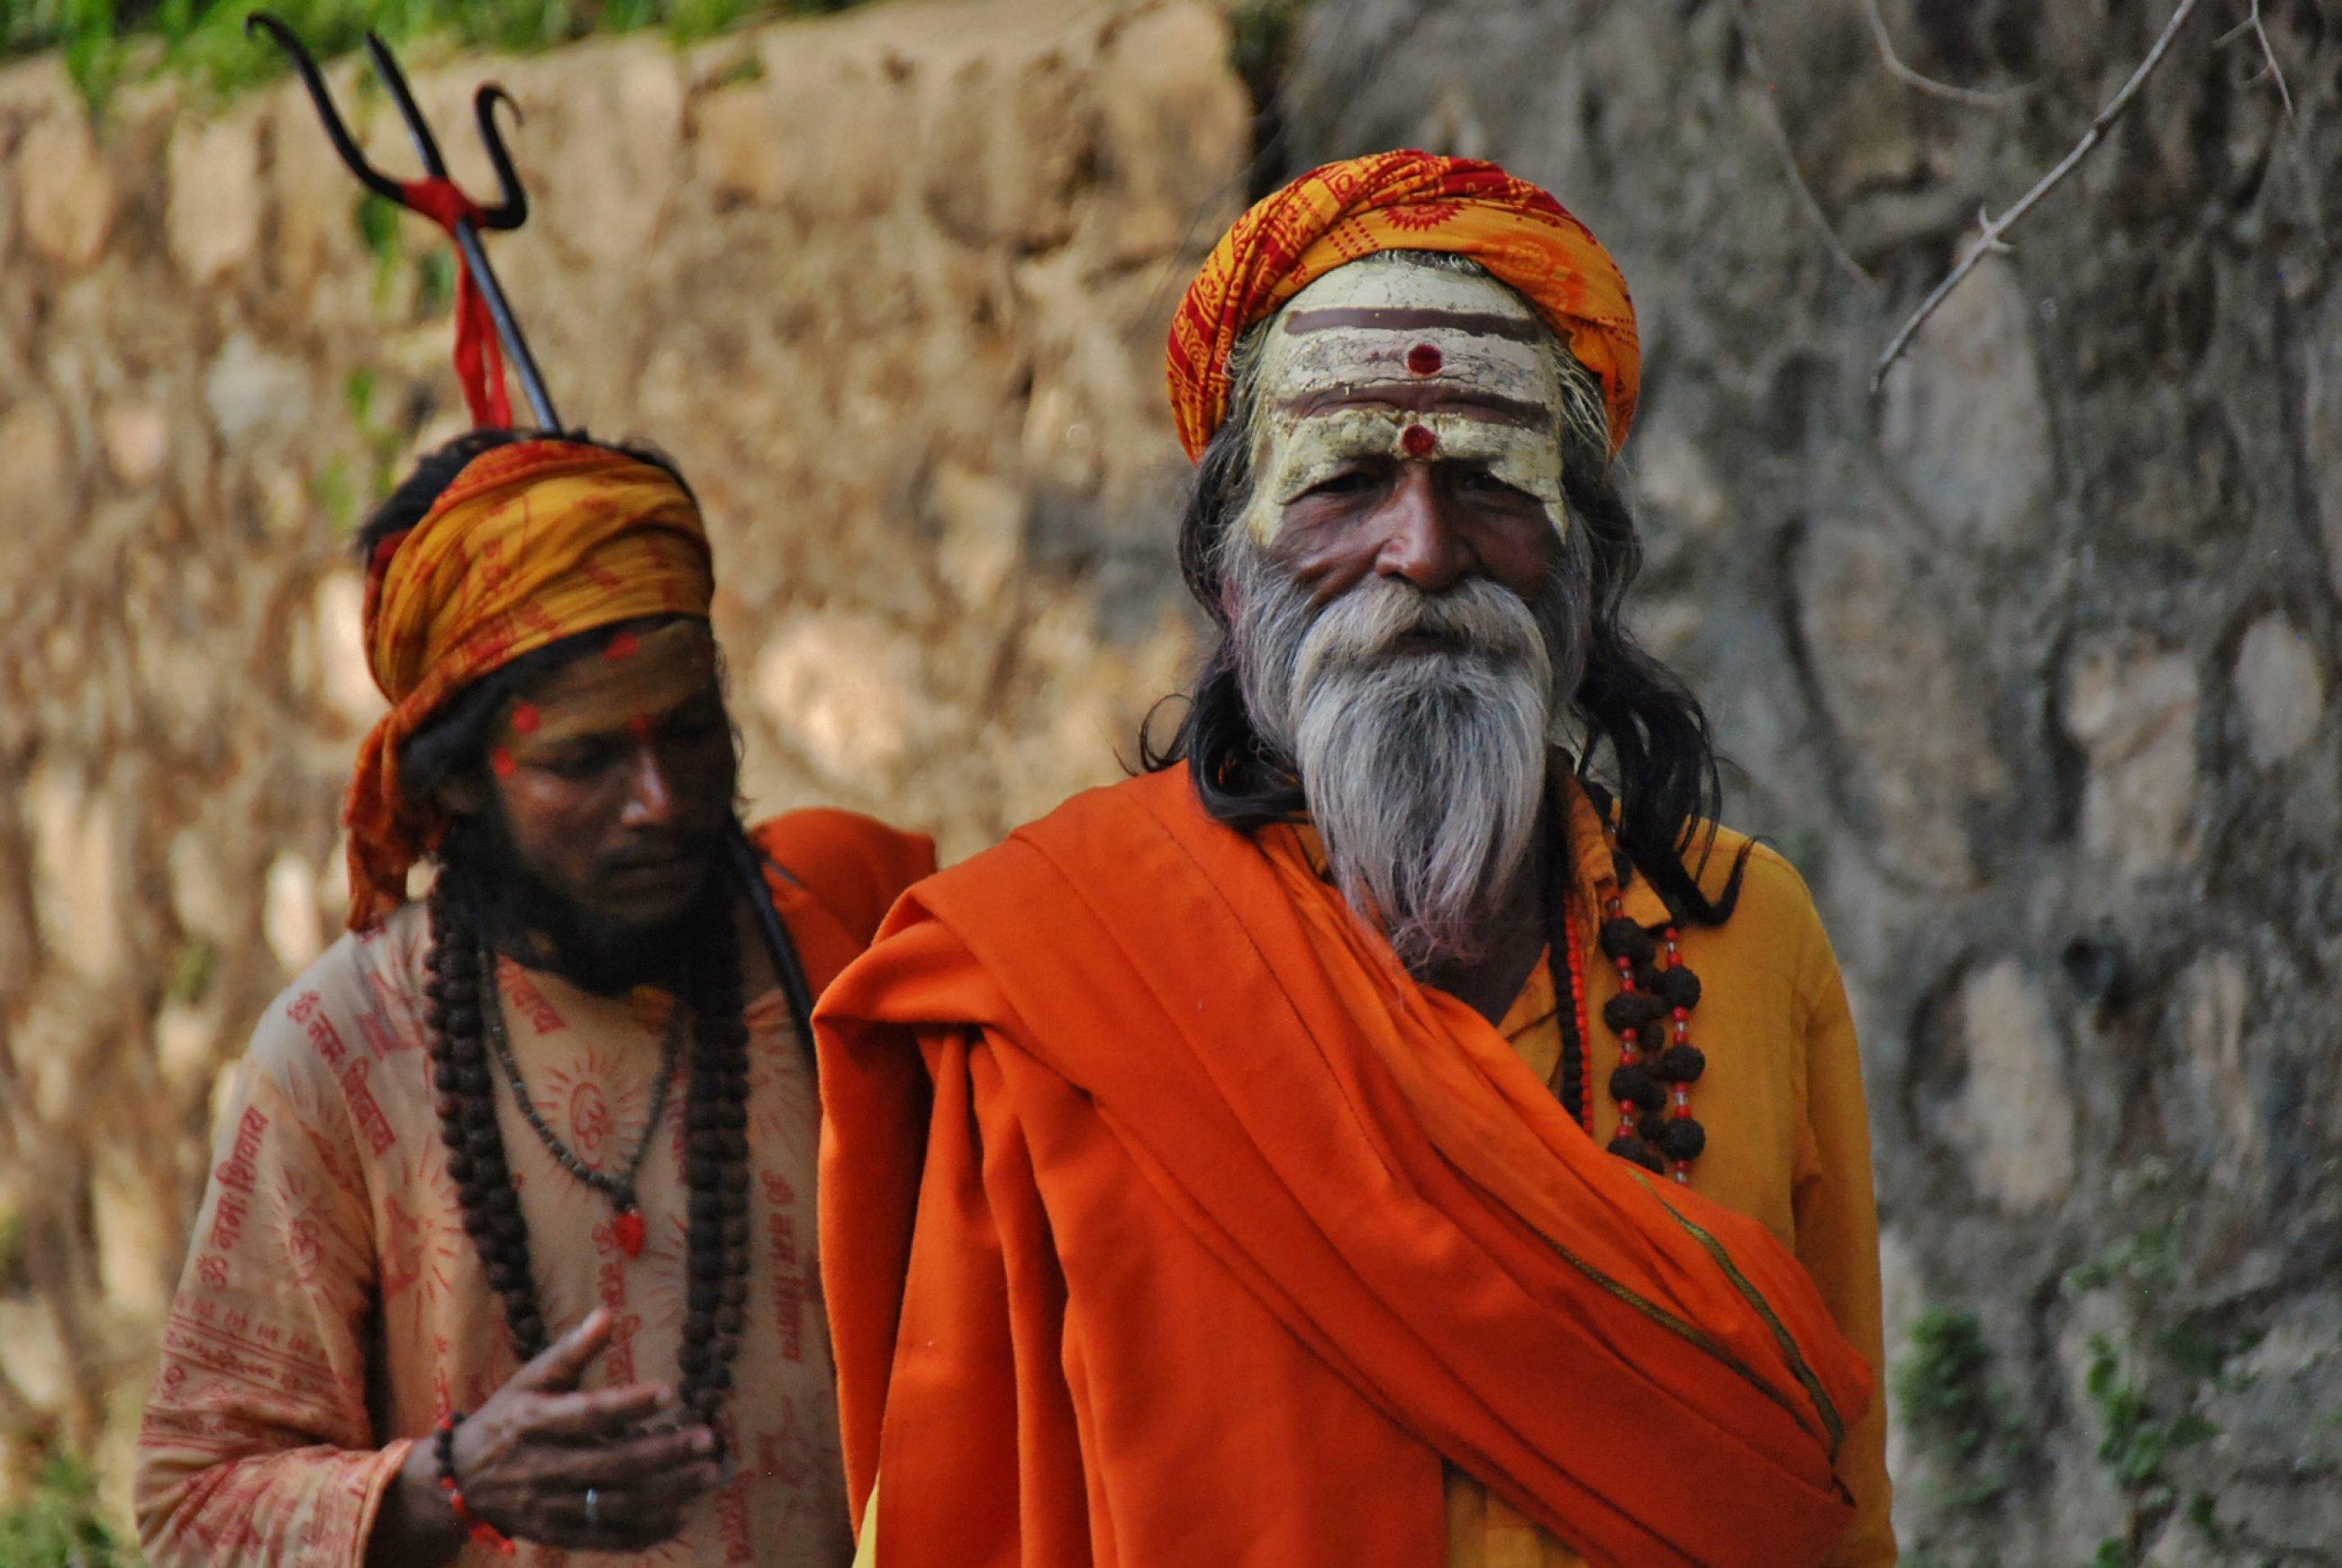 https://bubo.sk/uploads/galleries/16319/nepal-ctni-11-2014-mirka-sulka-375-.jpg